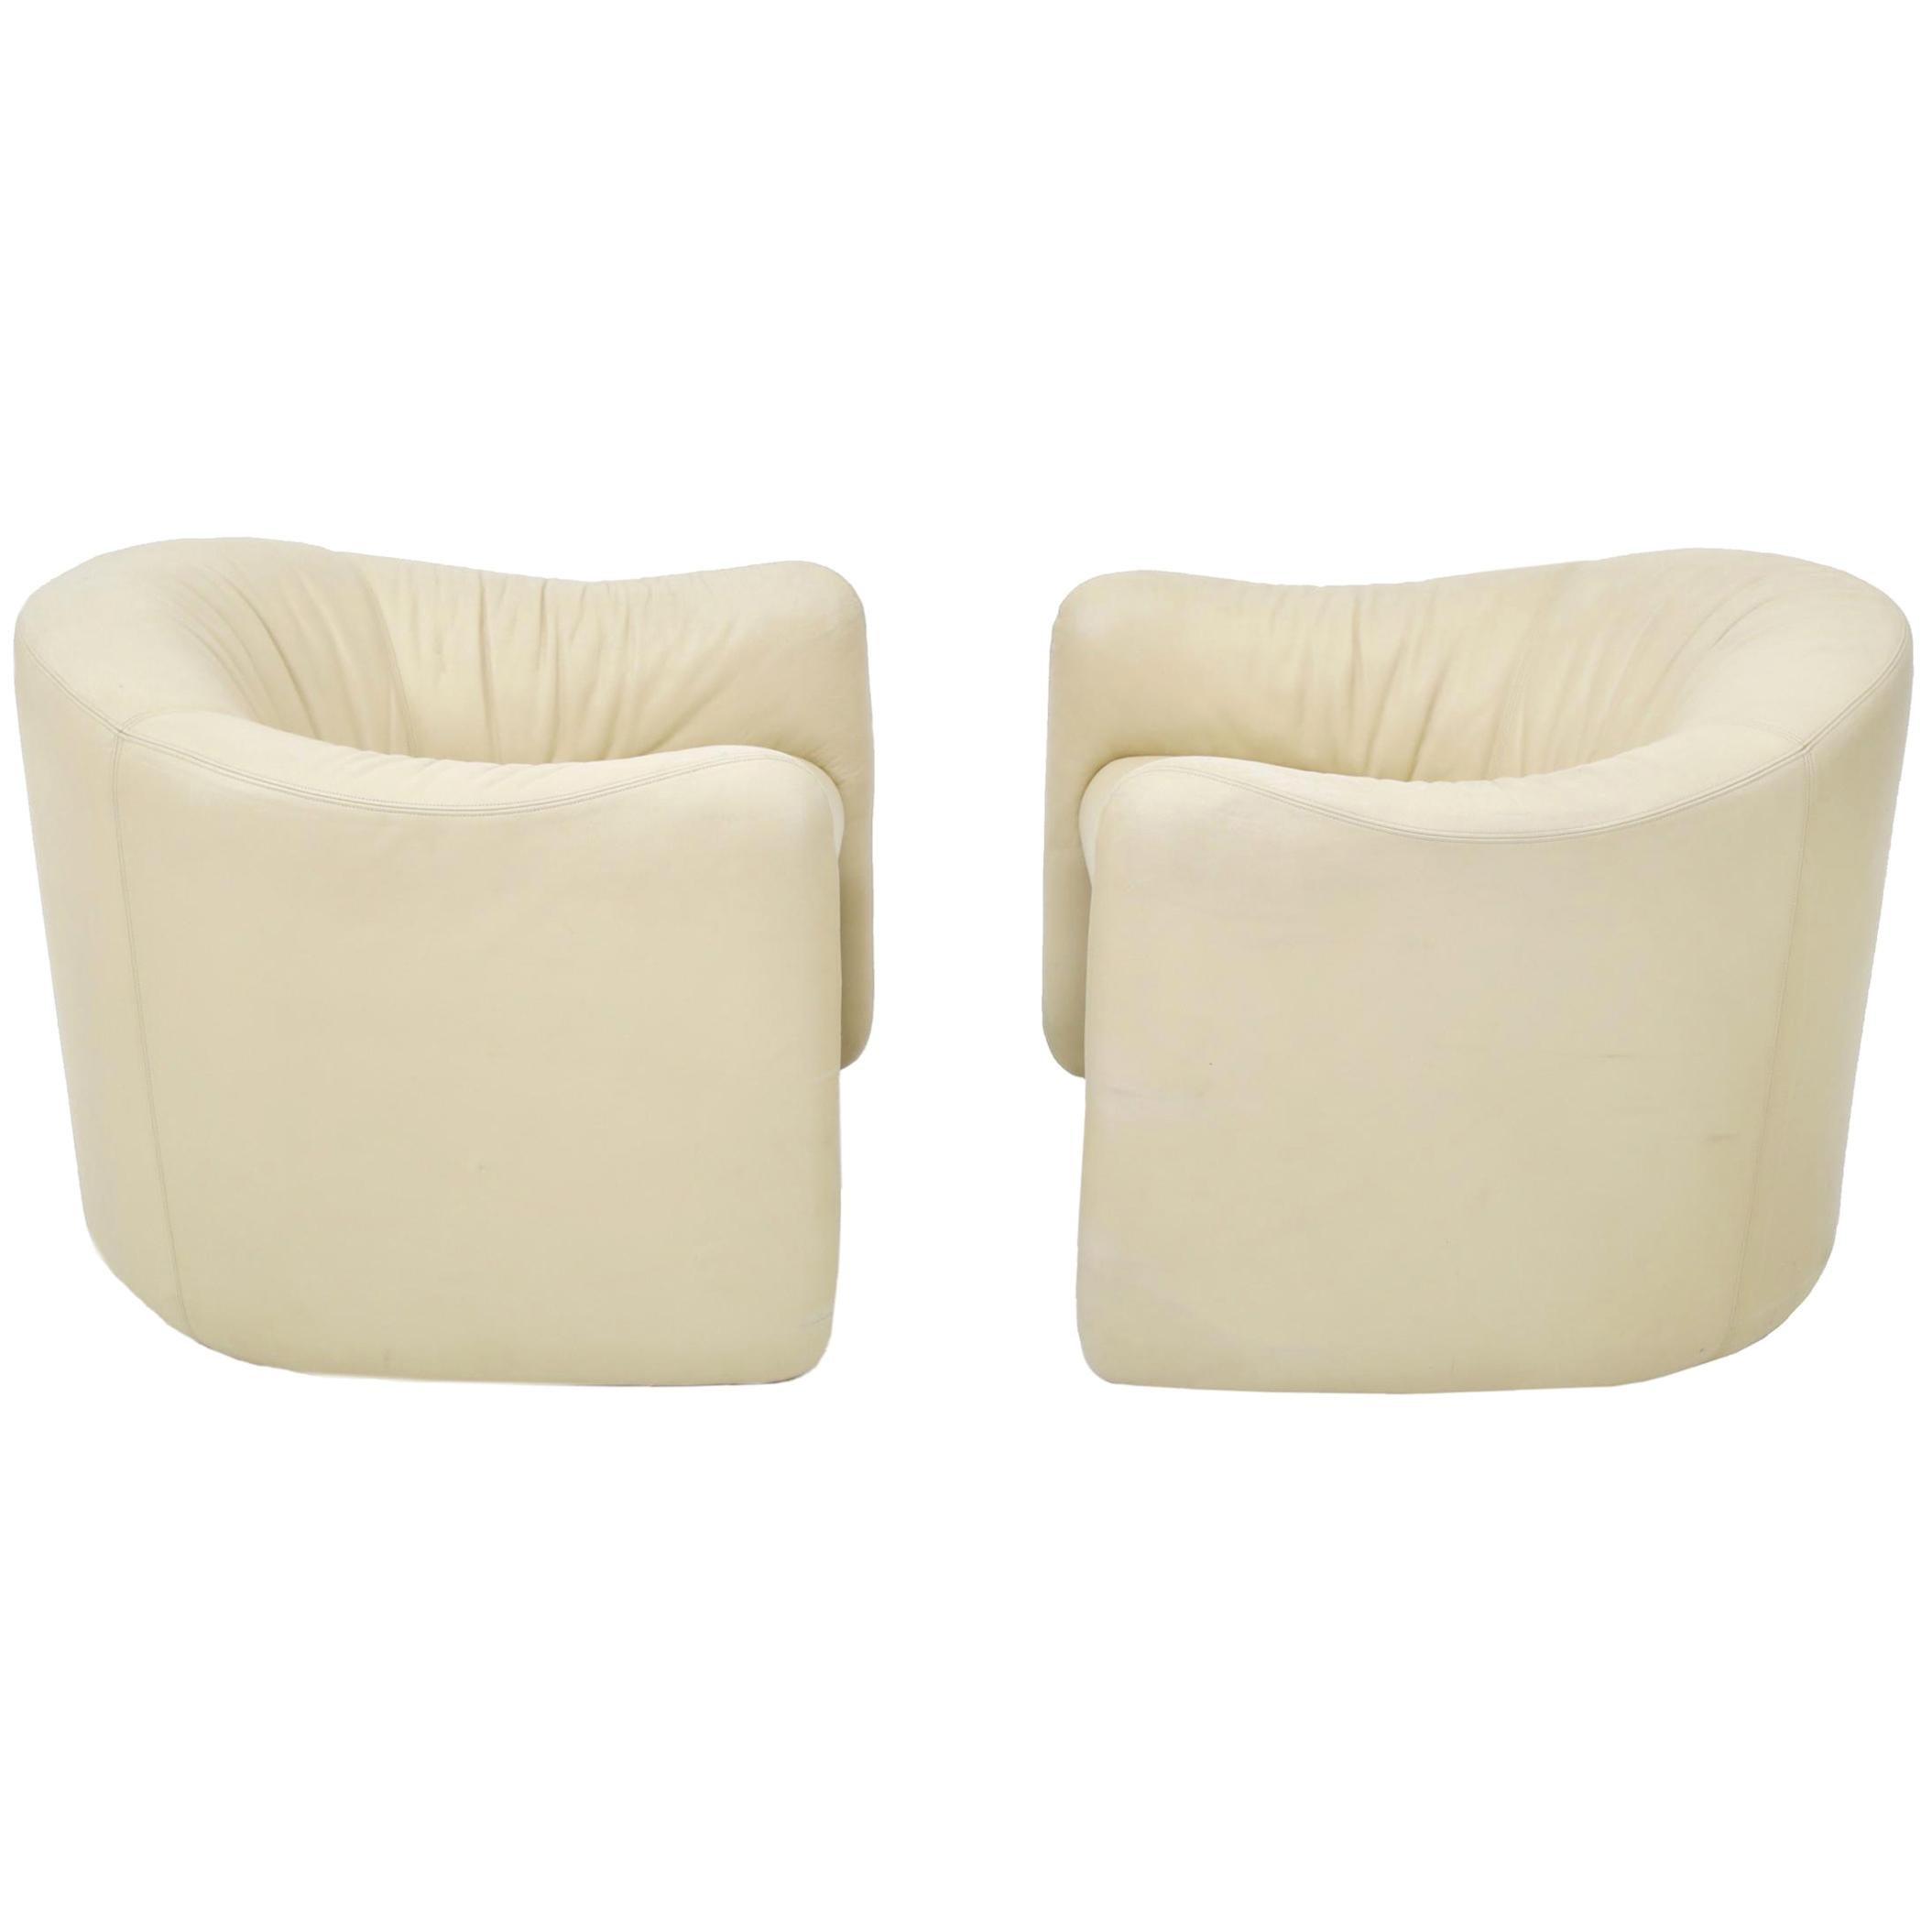 Leather Barrel Back Chairs, Metropolitan, 1970s